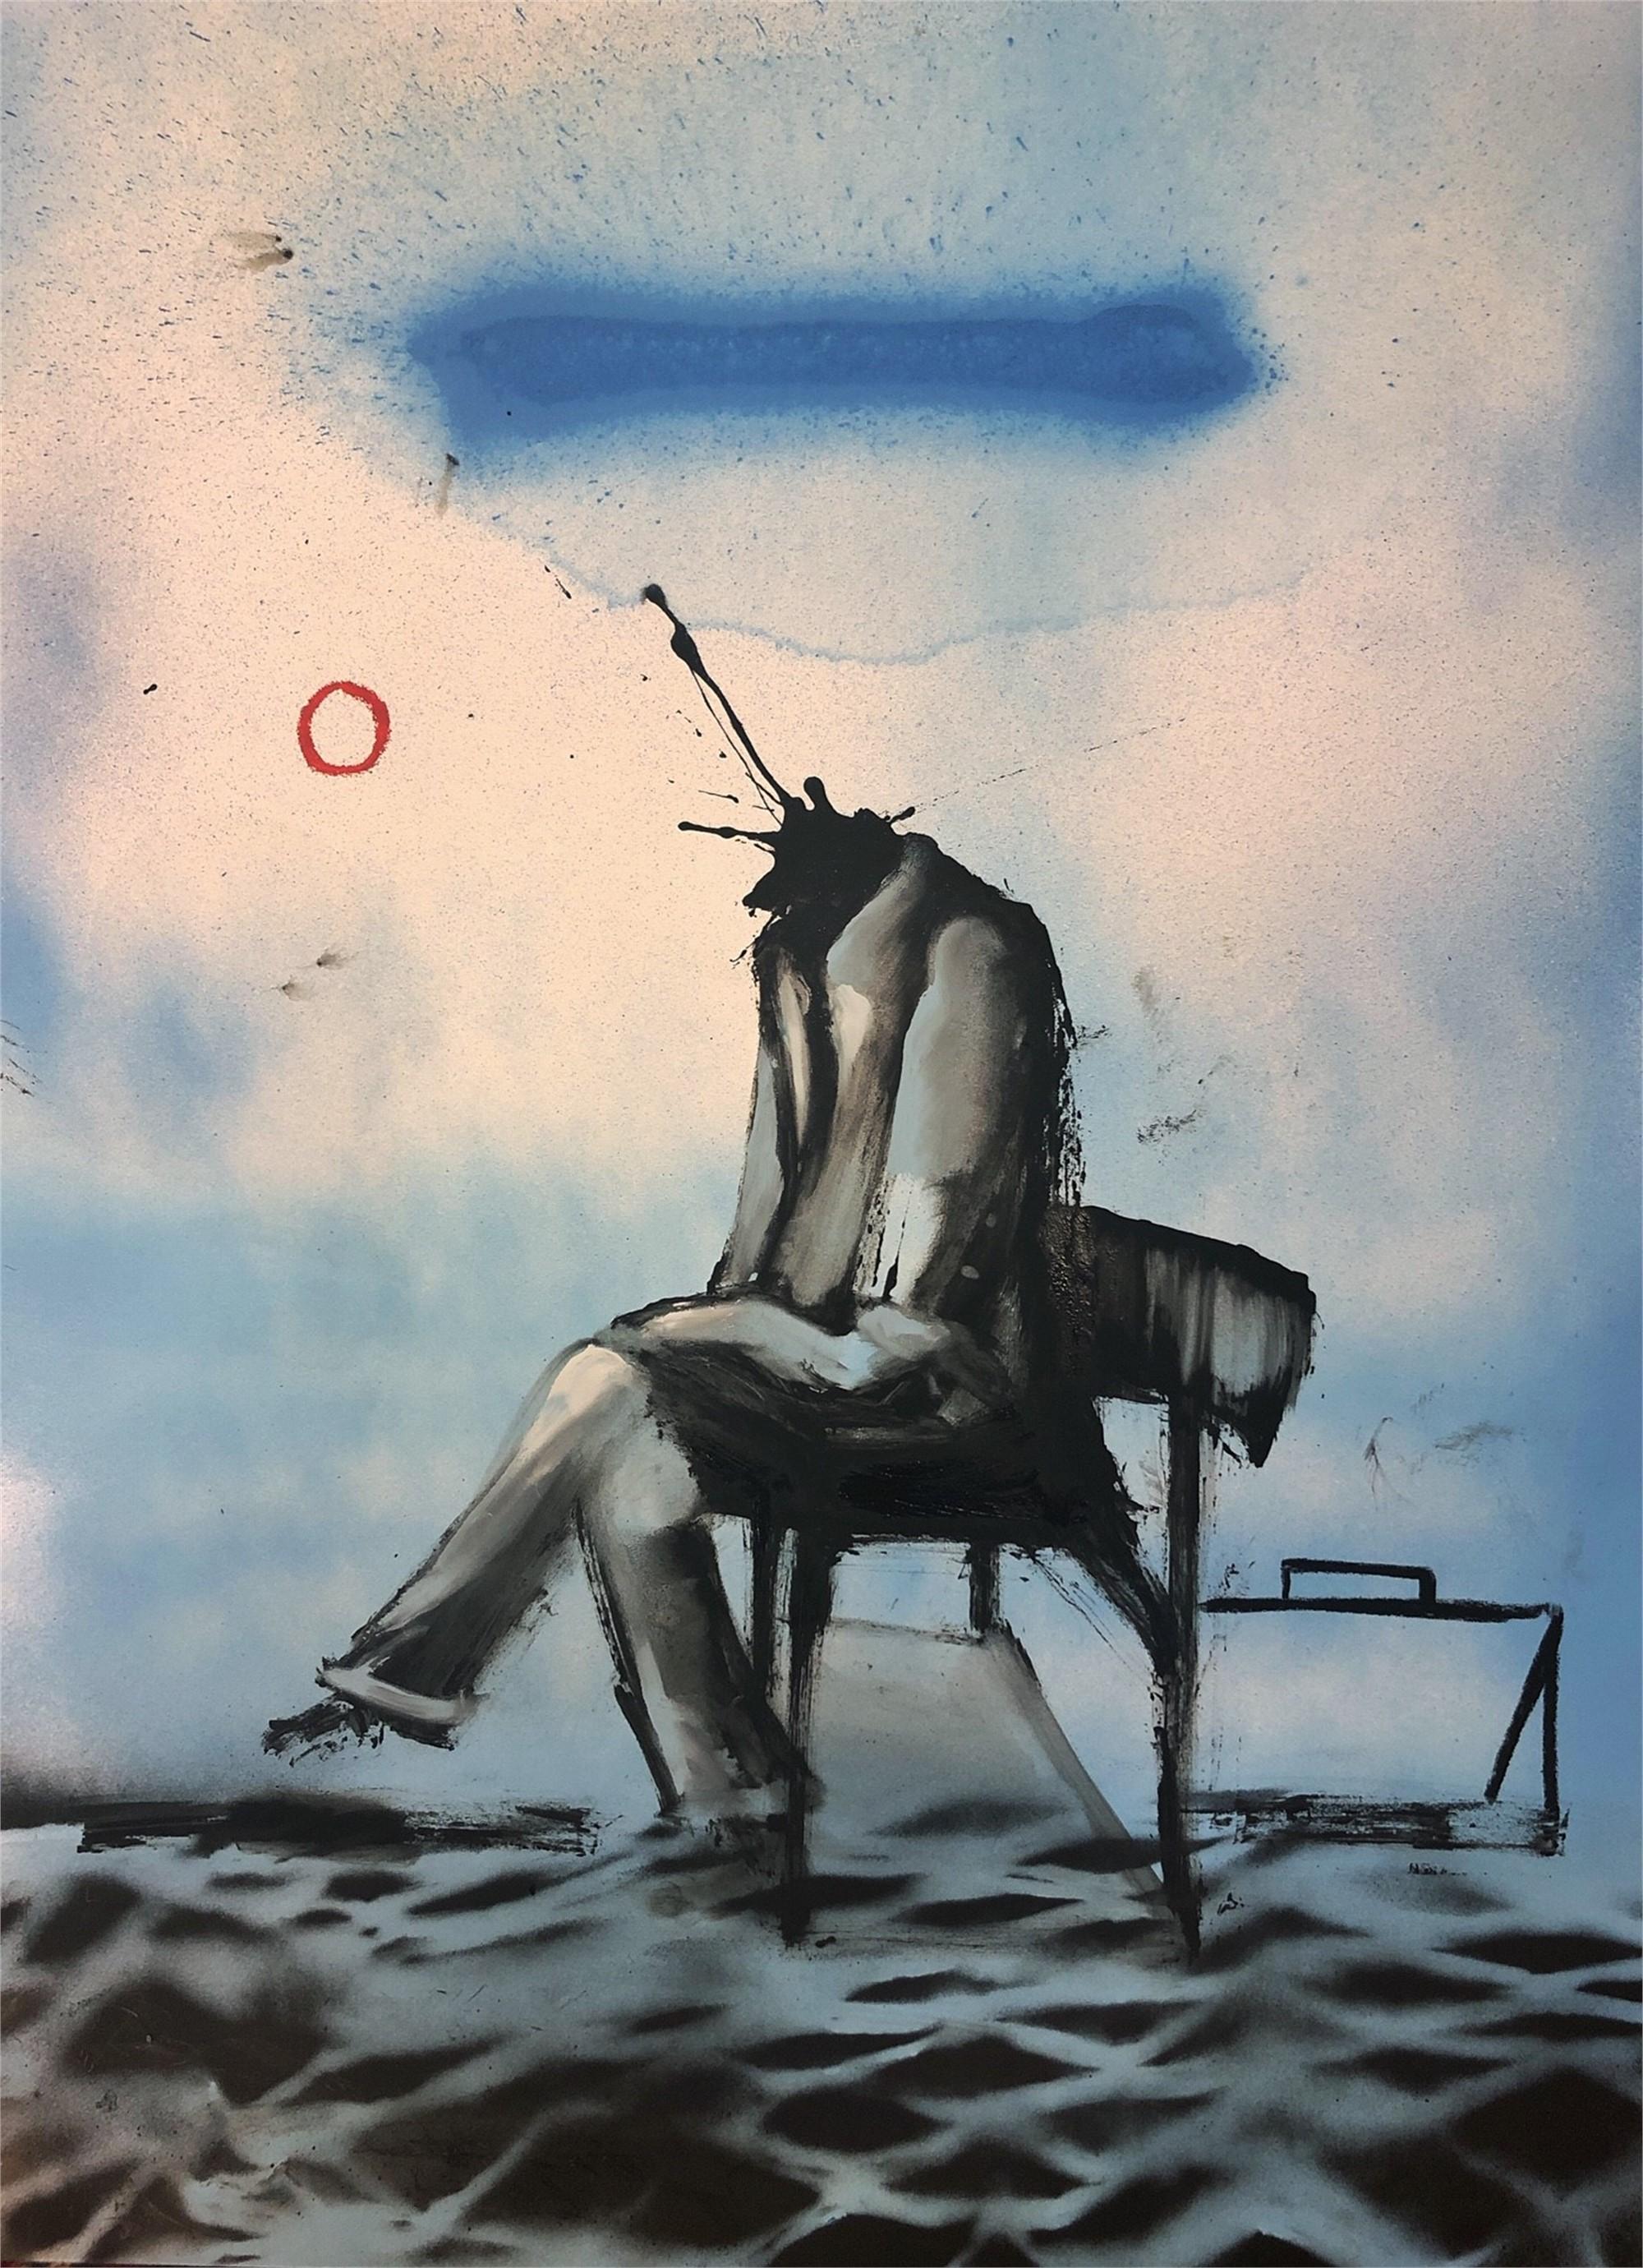 Faceless On Shaky Ground I by Marcus Jansen